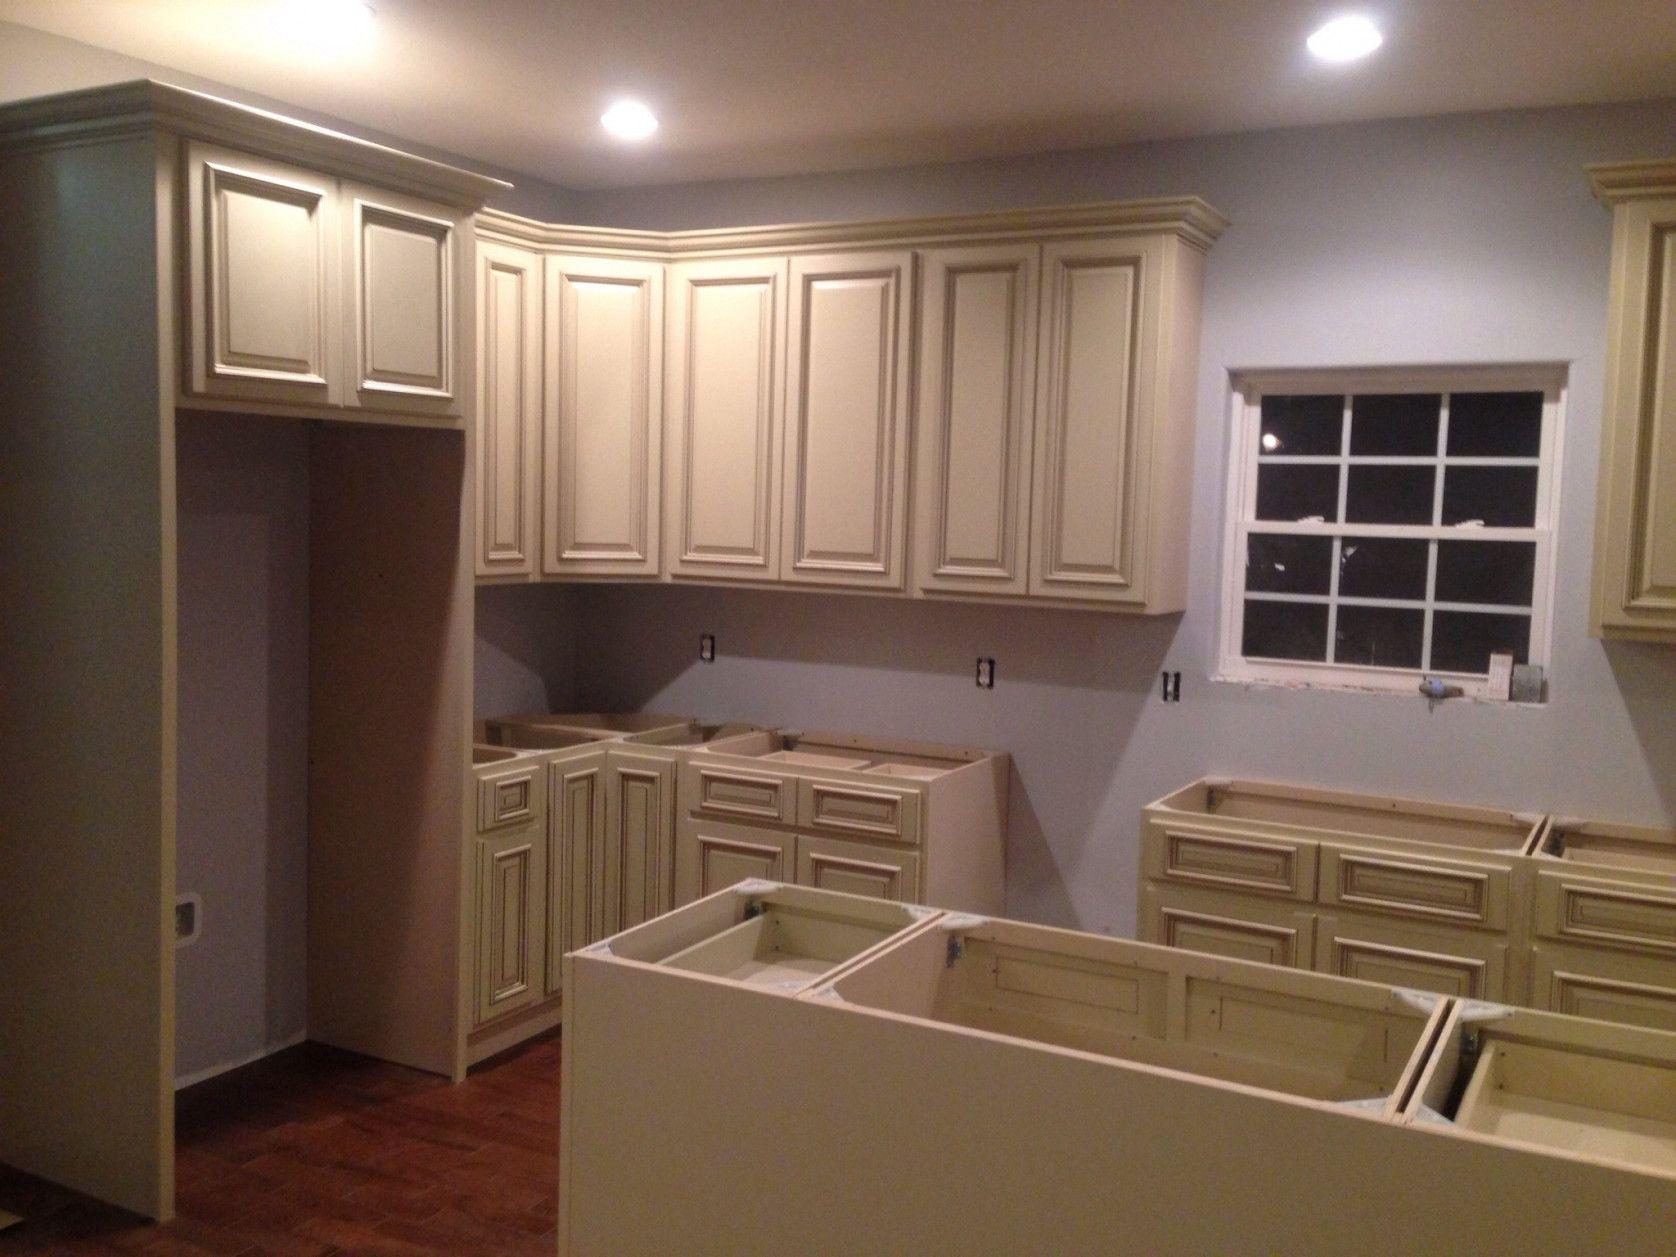 55+ Used Kitchen Cabinets Massachusetts - Backsplash for Kitchen ...